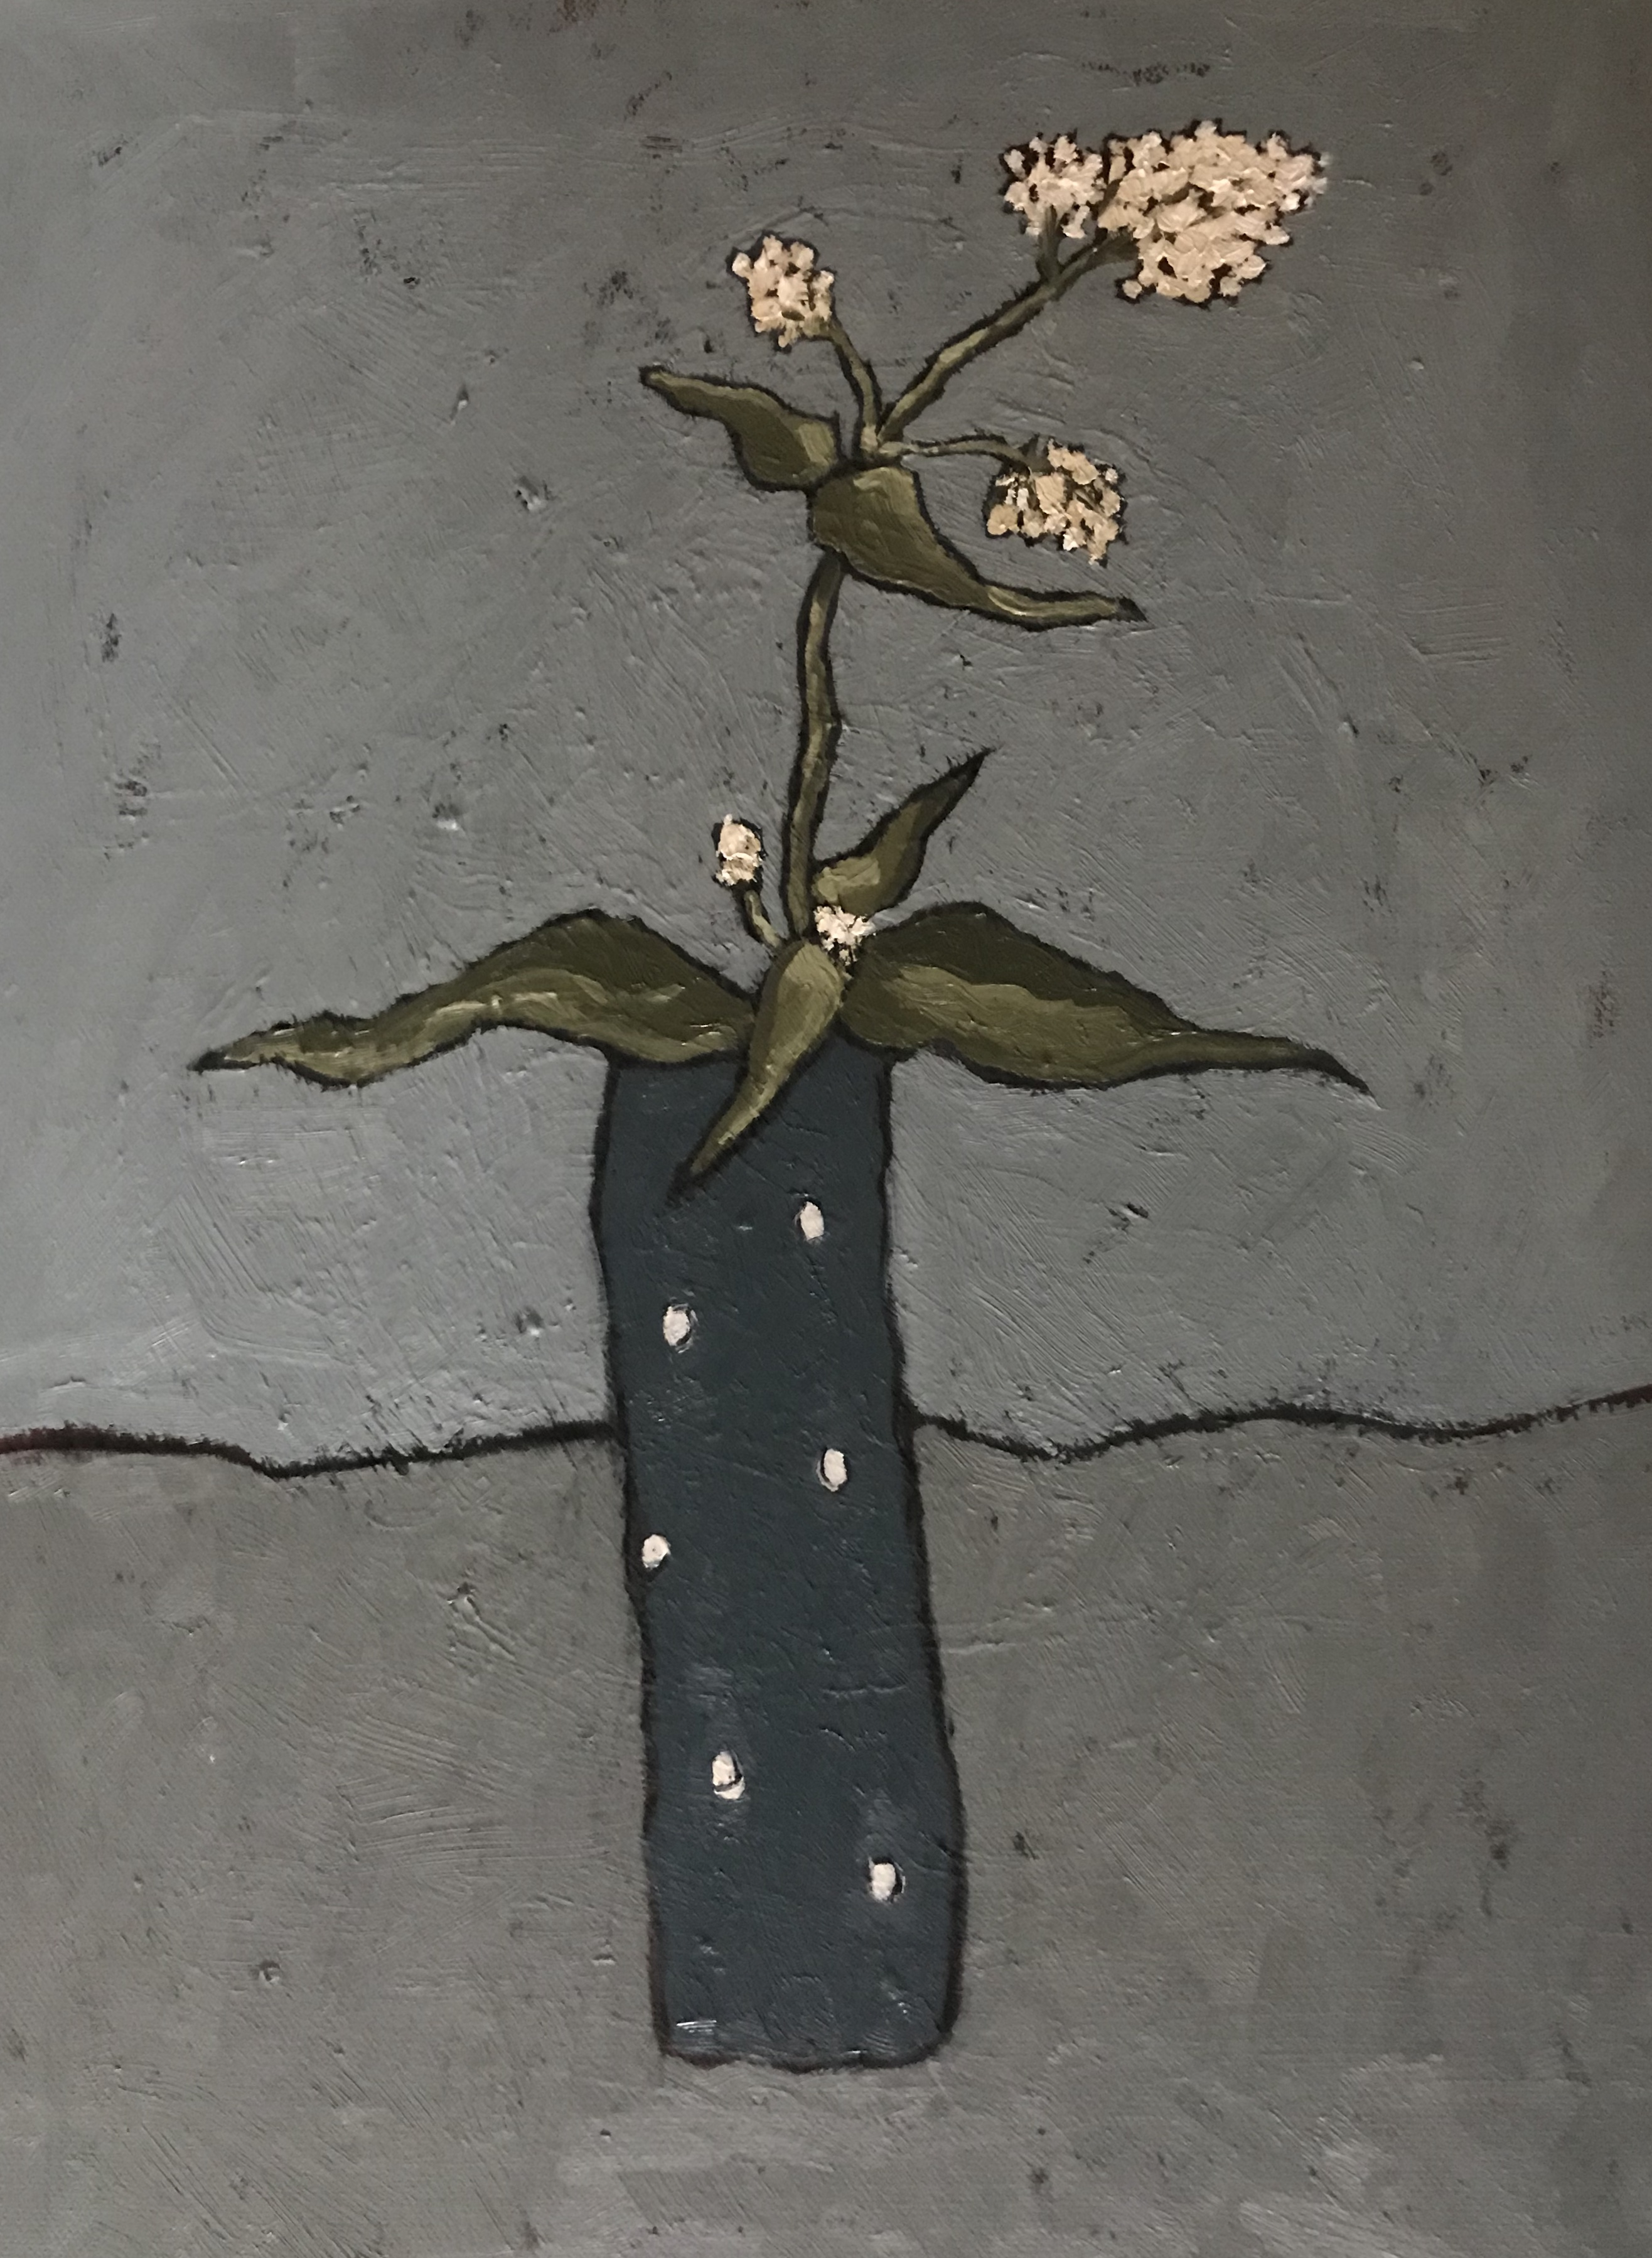 One stem